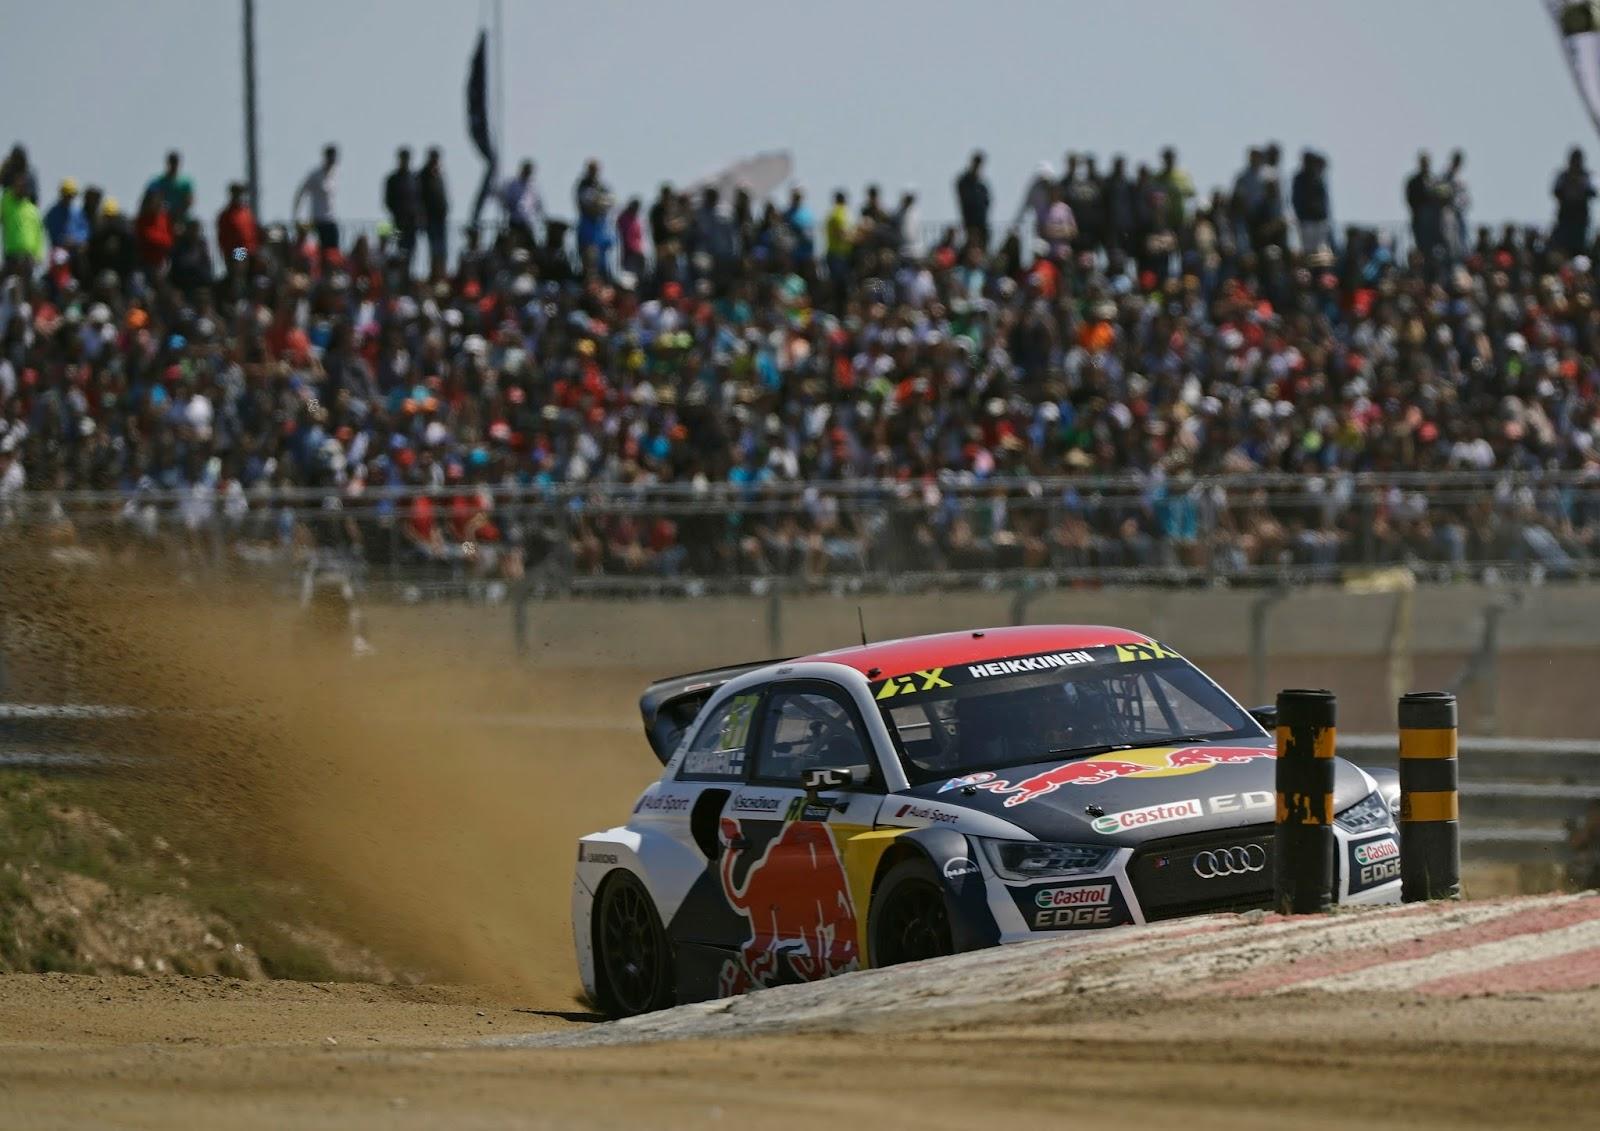 A173398 large Δες όλο τον αγώνα του συναρπαστικού Rallycross FIA, FIA World Rallycross Championship, Rally, videos, World RX